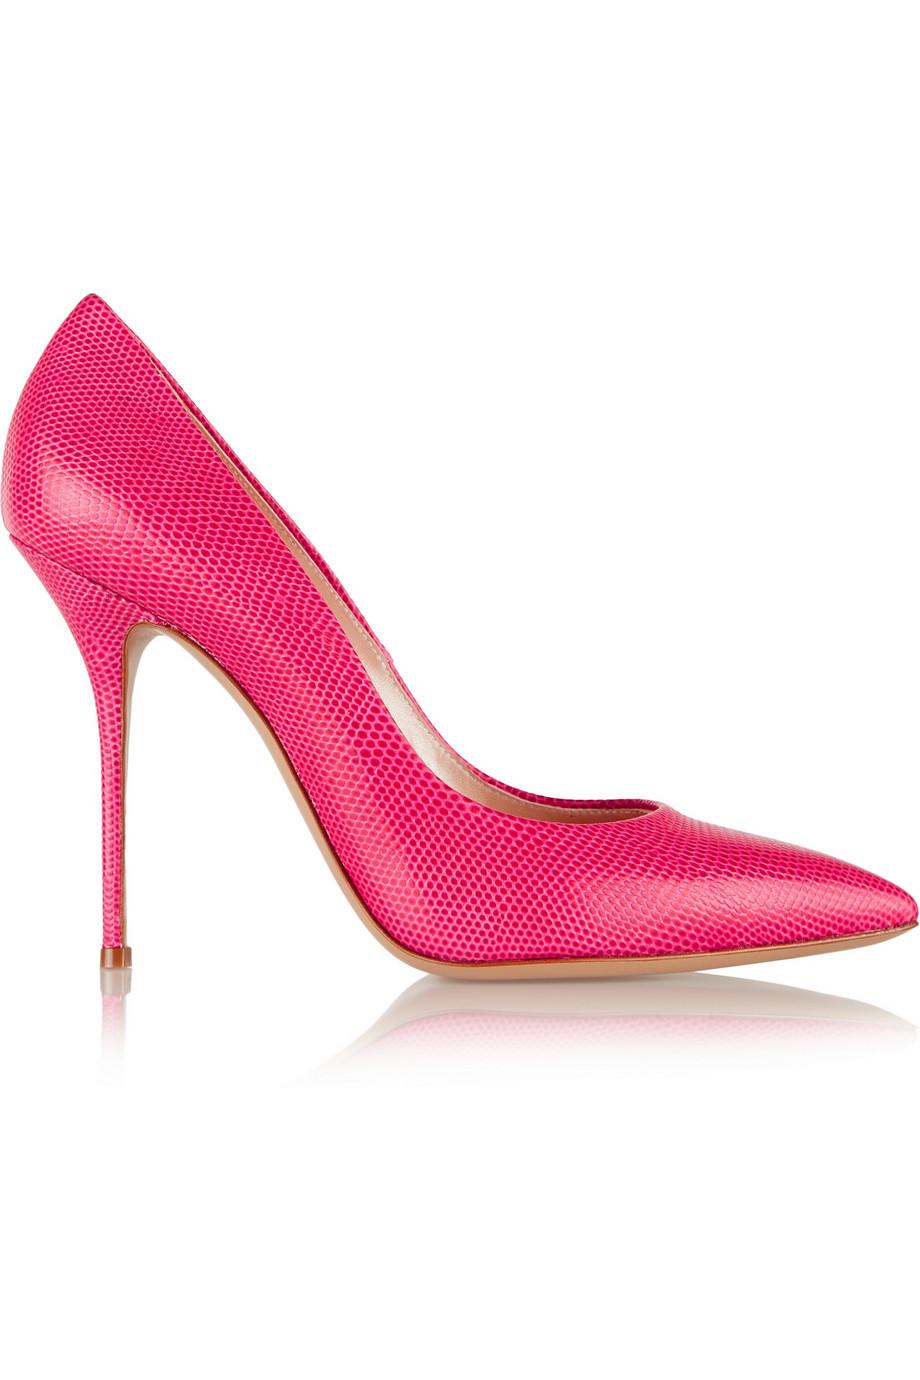 Casadei Snake Effect Neon Pink Pumps $220.50